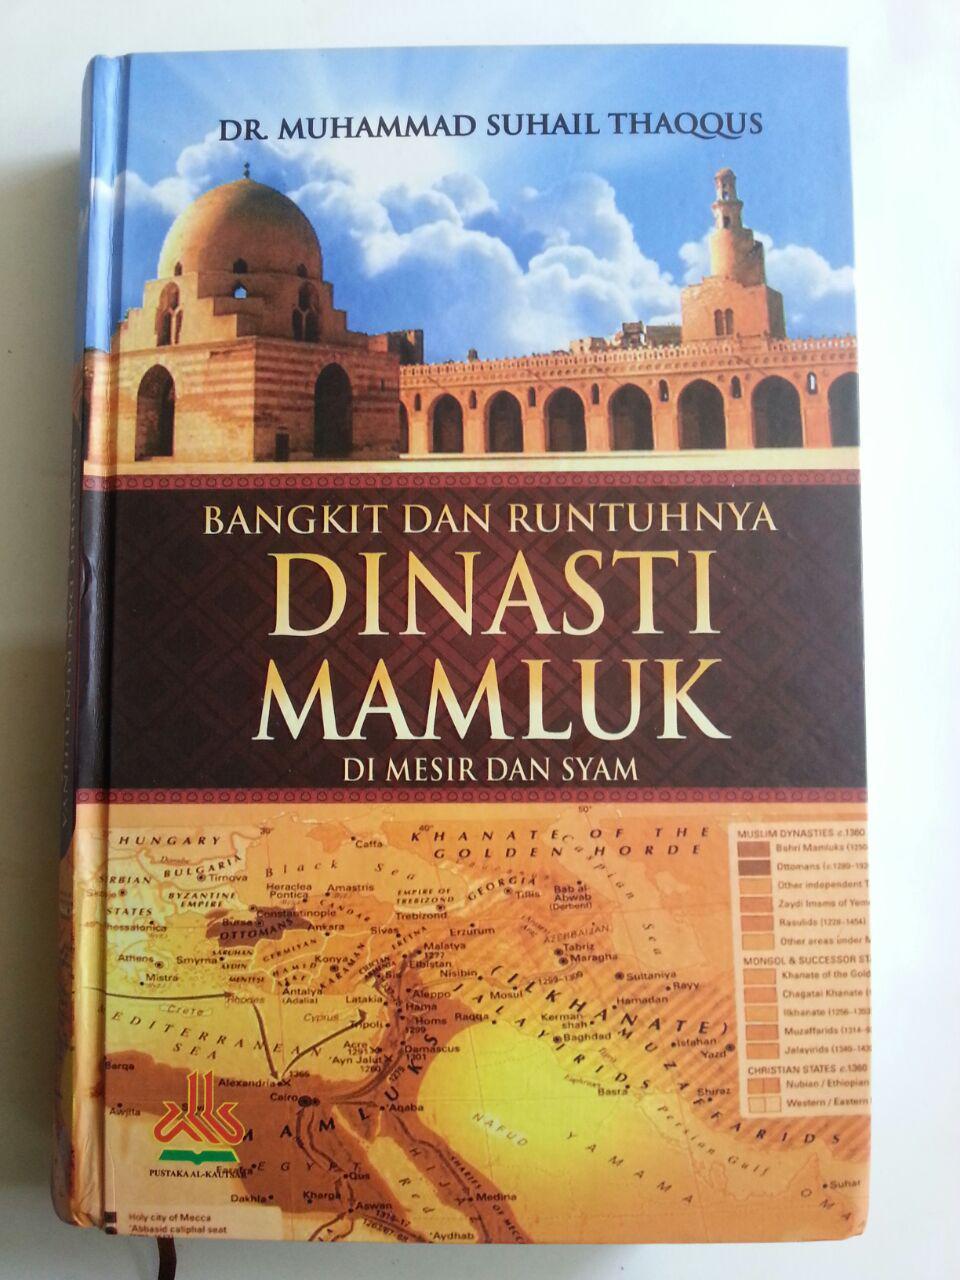 Buku Bangkit Dan Runtuhnya Dinasti Mamluk Di Mesir Dan Syam cover 2